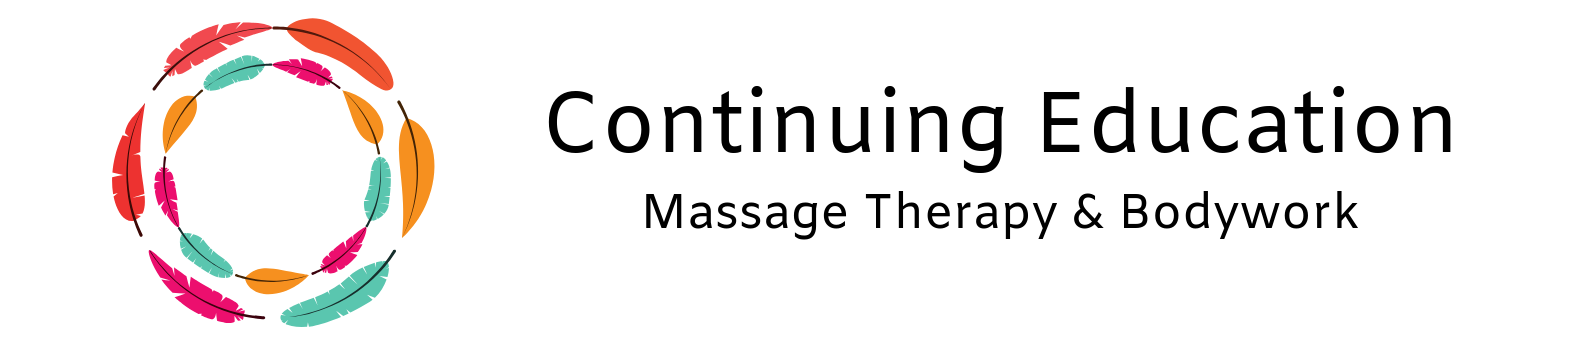 CE Page Header